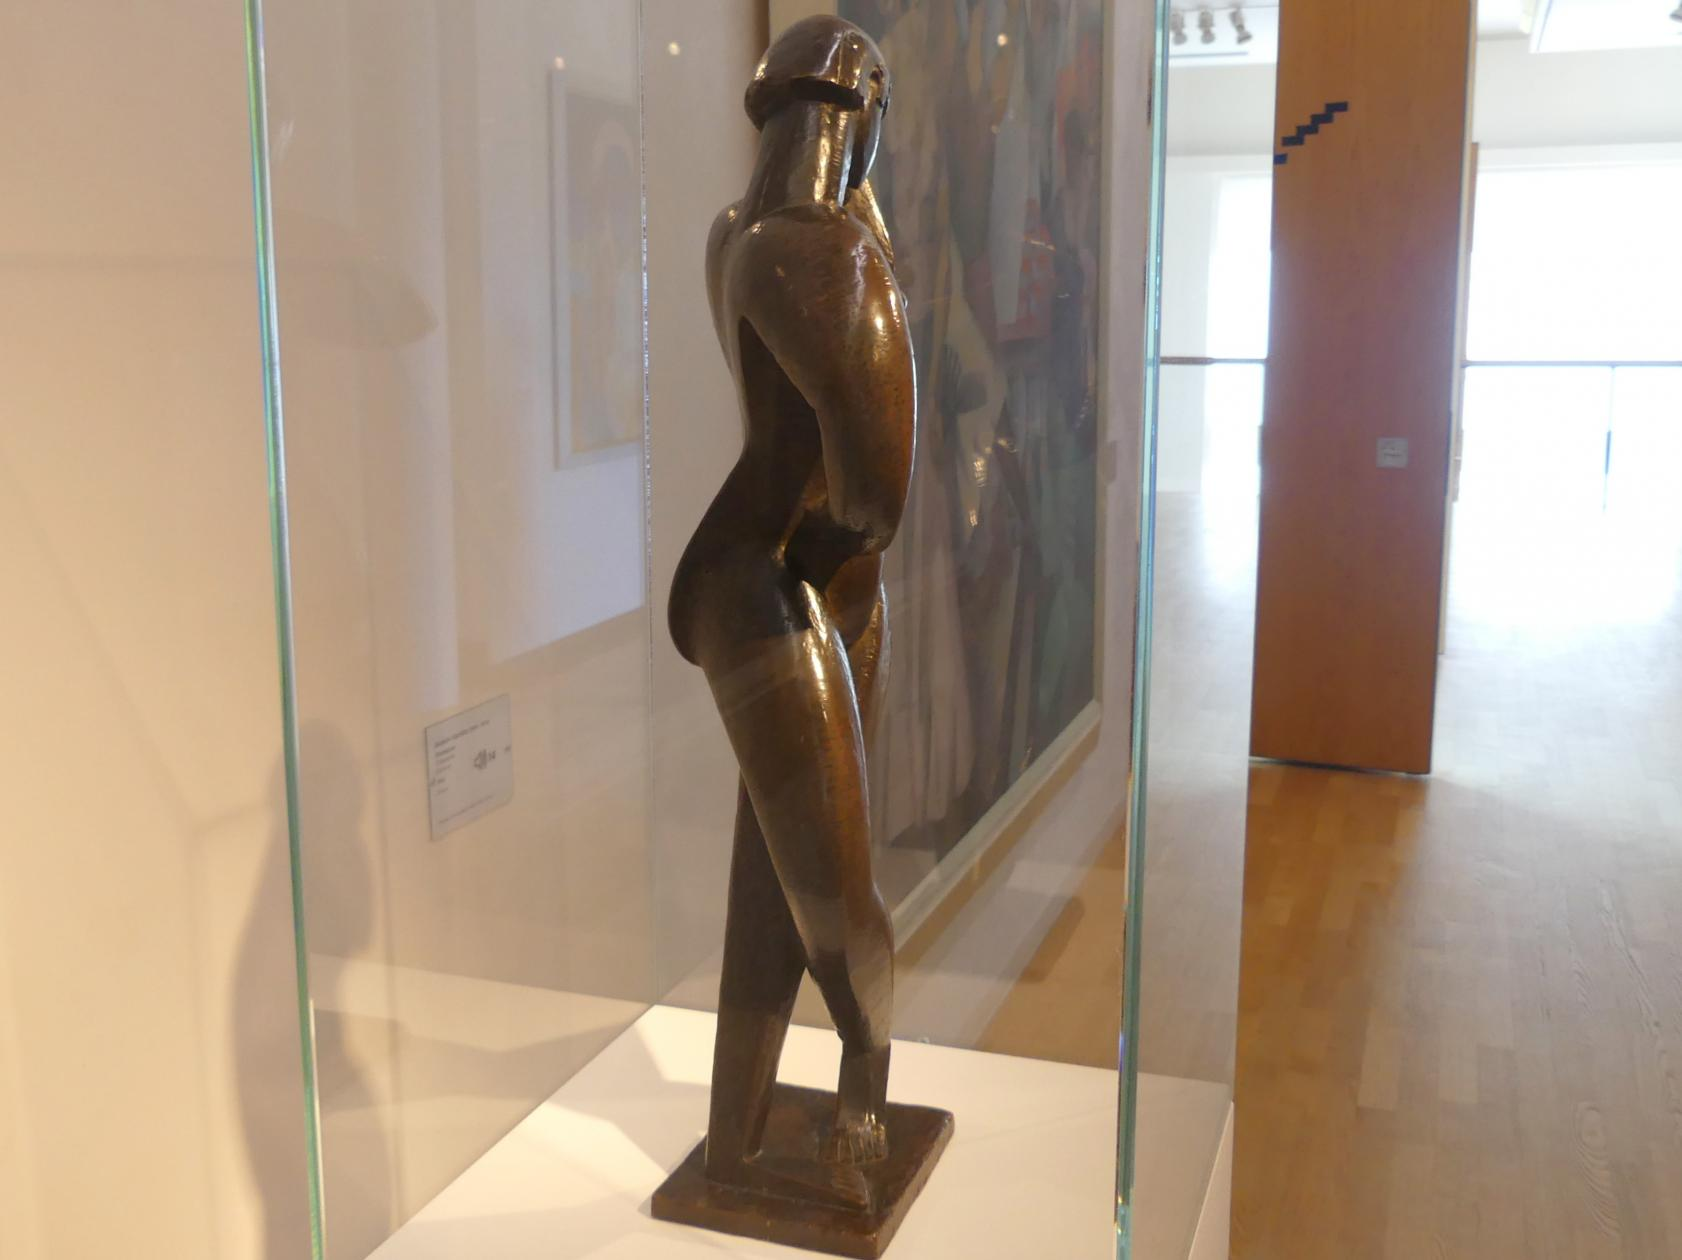 Jacques Lipchitz: Tänzerin, 1913, Bild 3/4